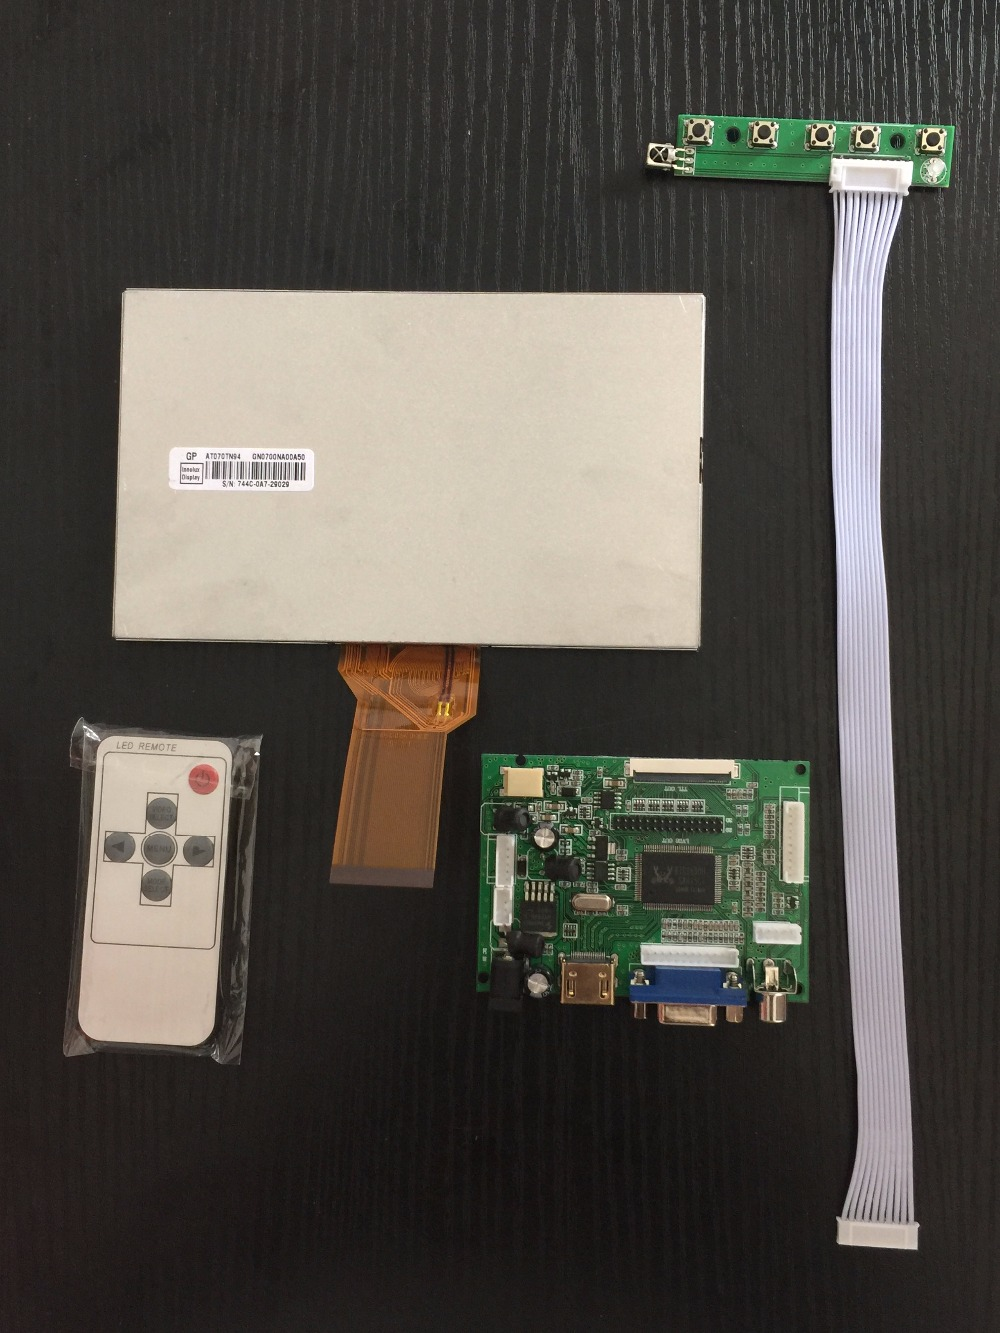 7 inch 800x480 Raspberry Pi 3 IPS LCD Screen Display Monitor Module With HDMI VGA AV driver board keyboard kit